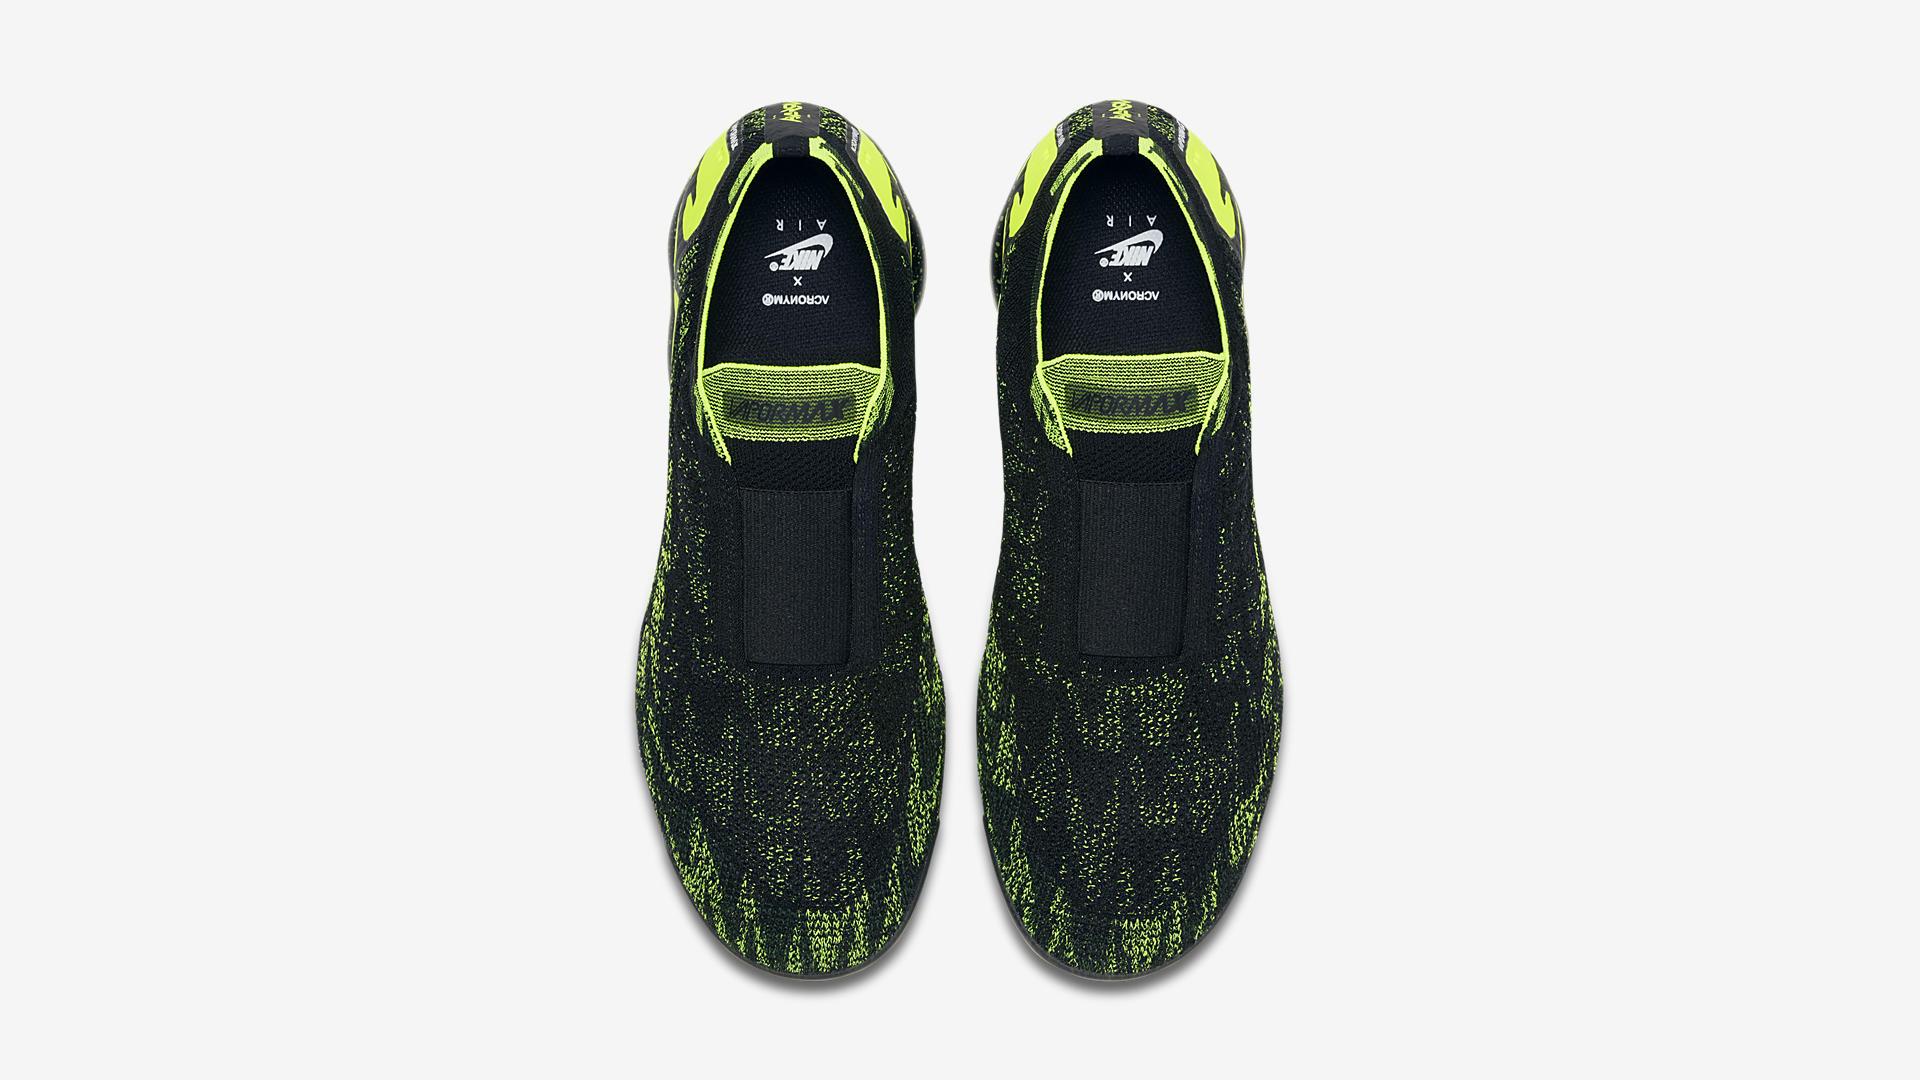 AQ0996 007 ACRONYM x Nike Air Vapormax Moc 2 Black Volt 2